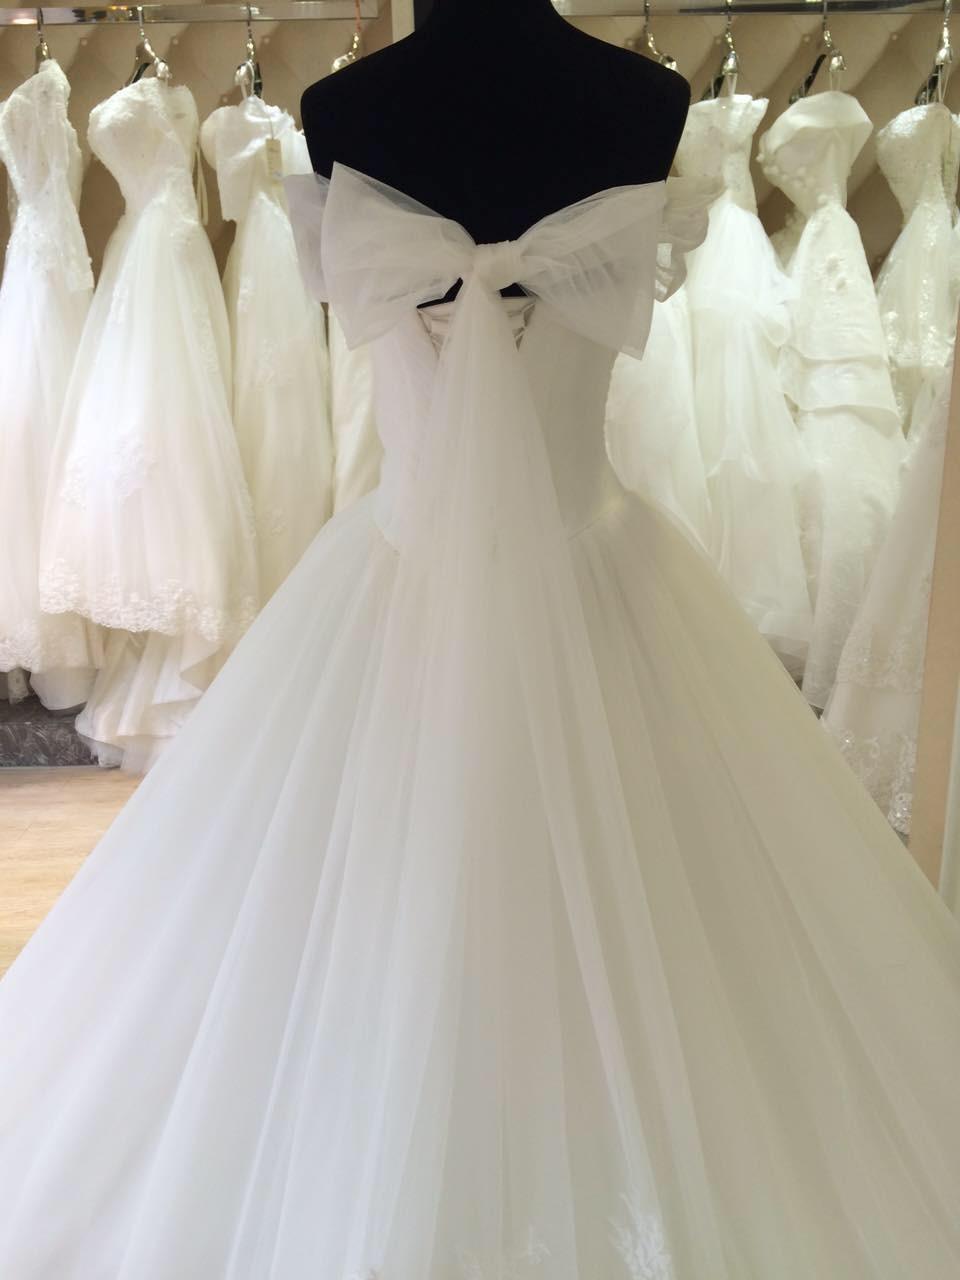 Plus size turkish wedding dresses for big women sale for Online wedding dresses for sale